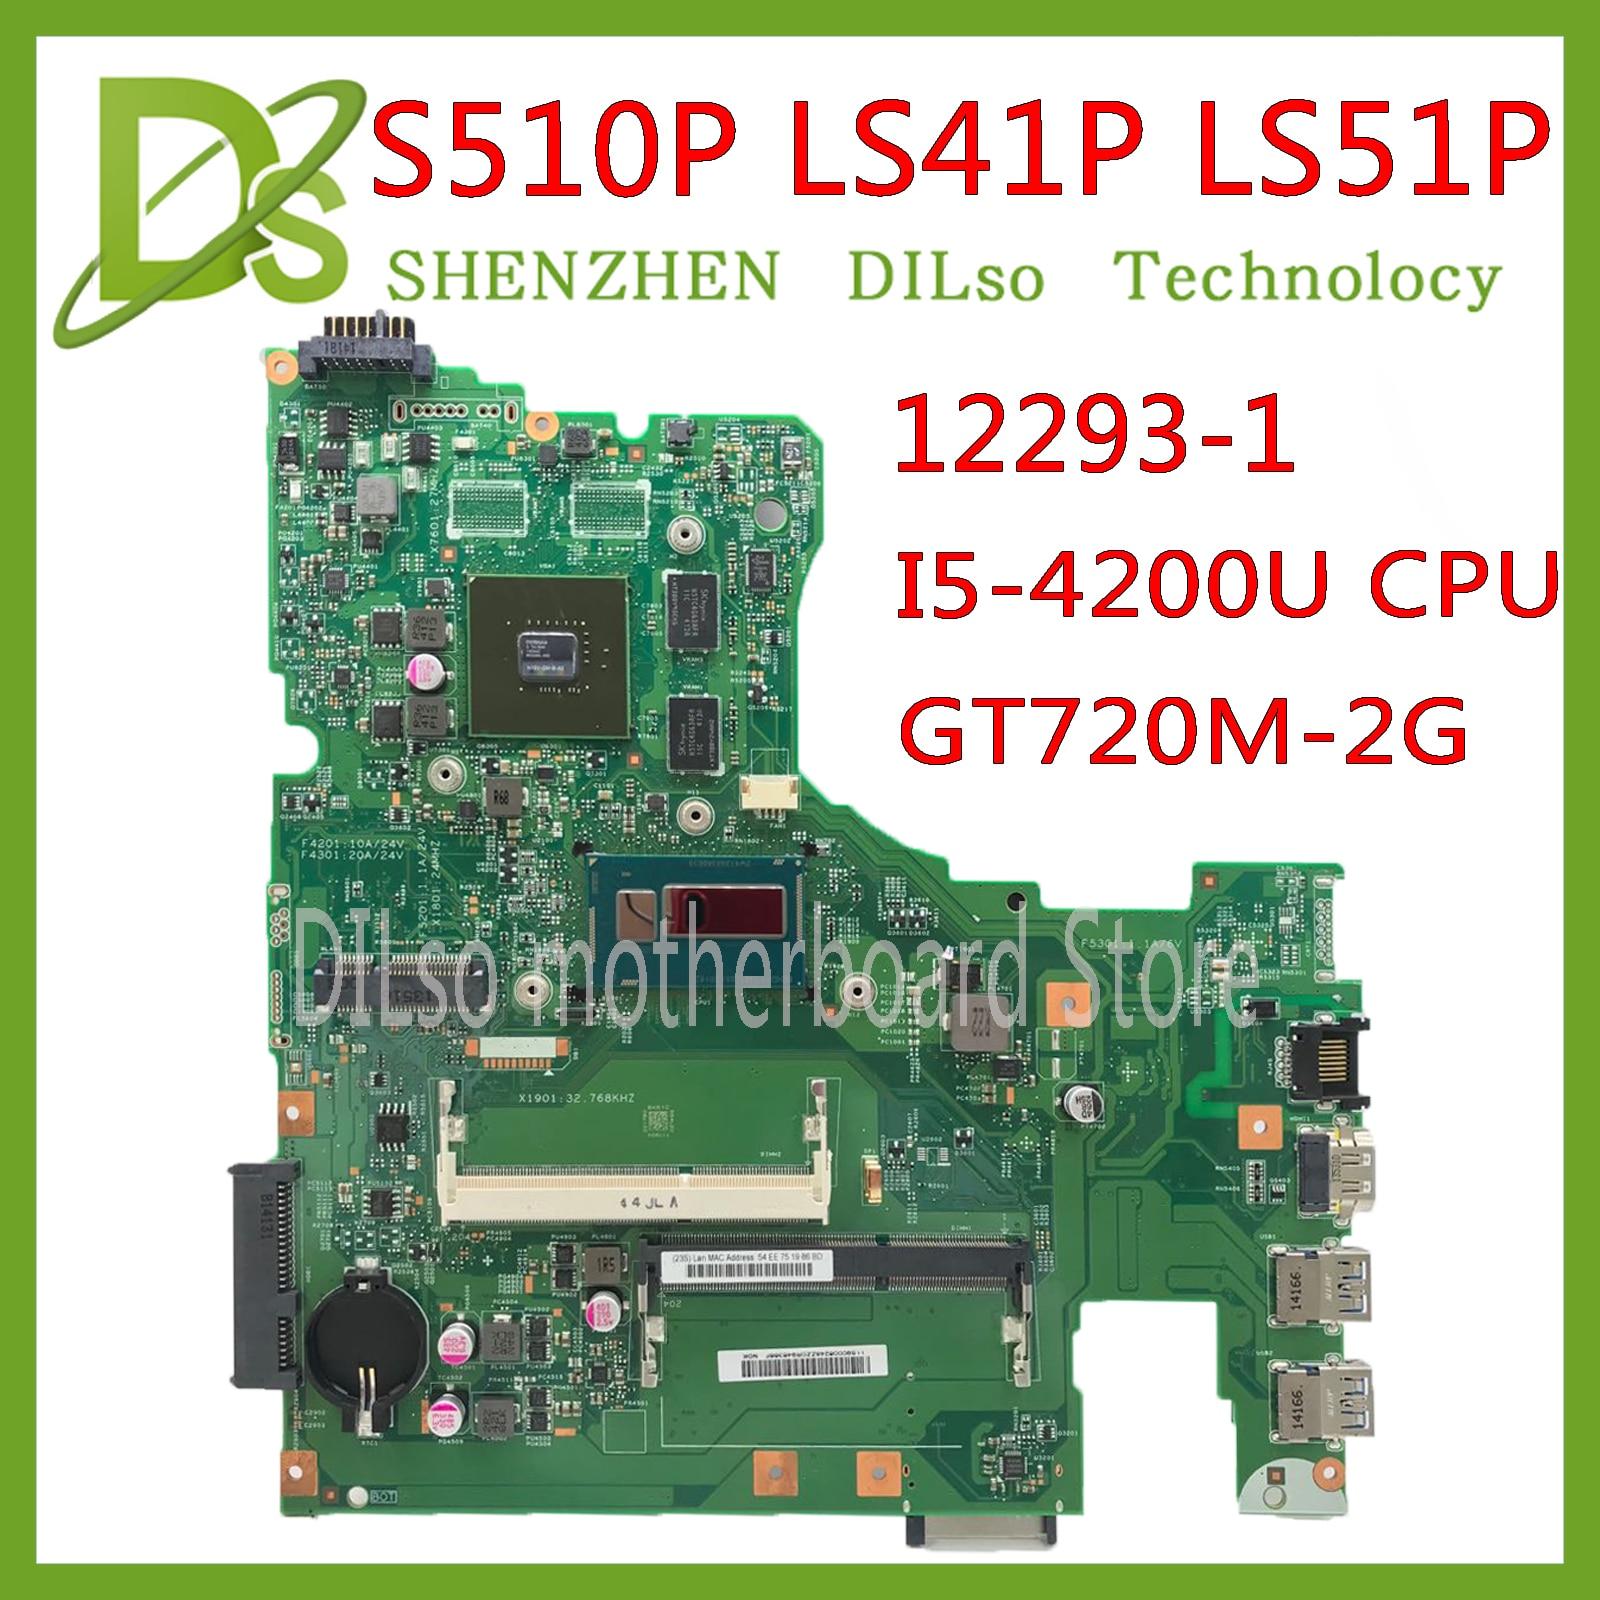 KEFU 12293-1 48.4L106. 011 материнская плата для Lenovo S510P LS41P LS51P материнская плата I5-4200U ЦП GT720M-2G Оригинальная работа протестирована